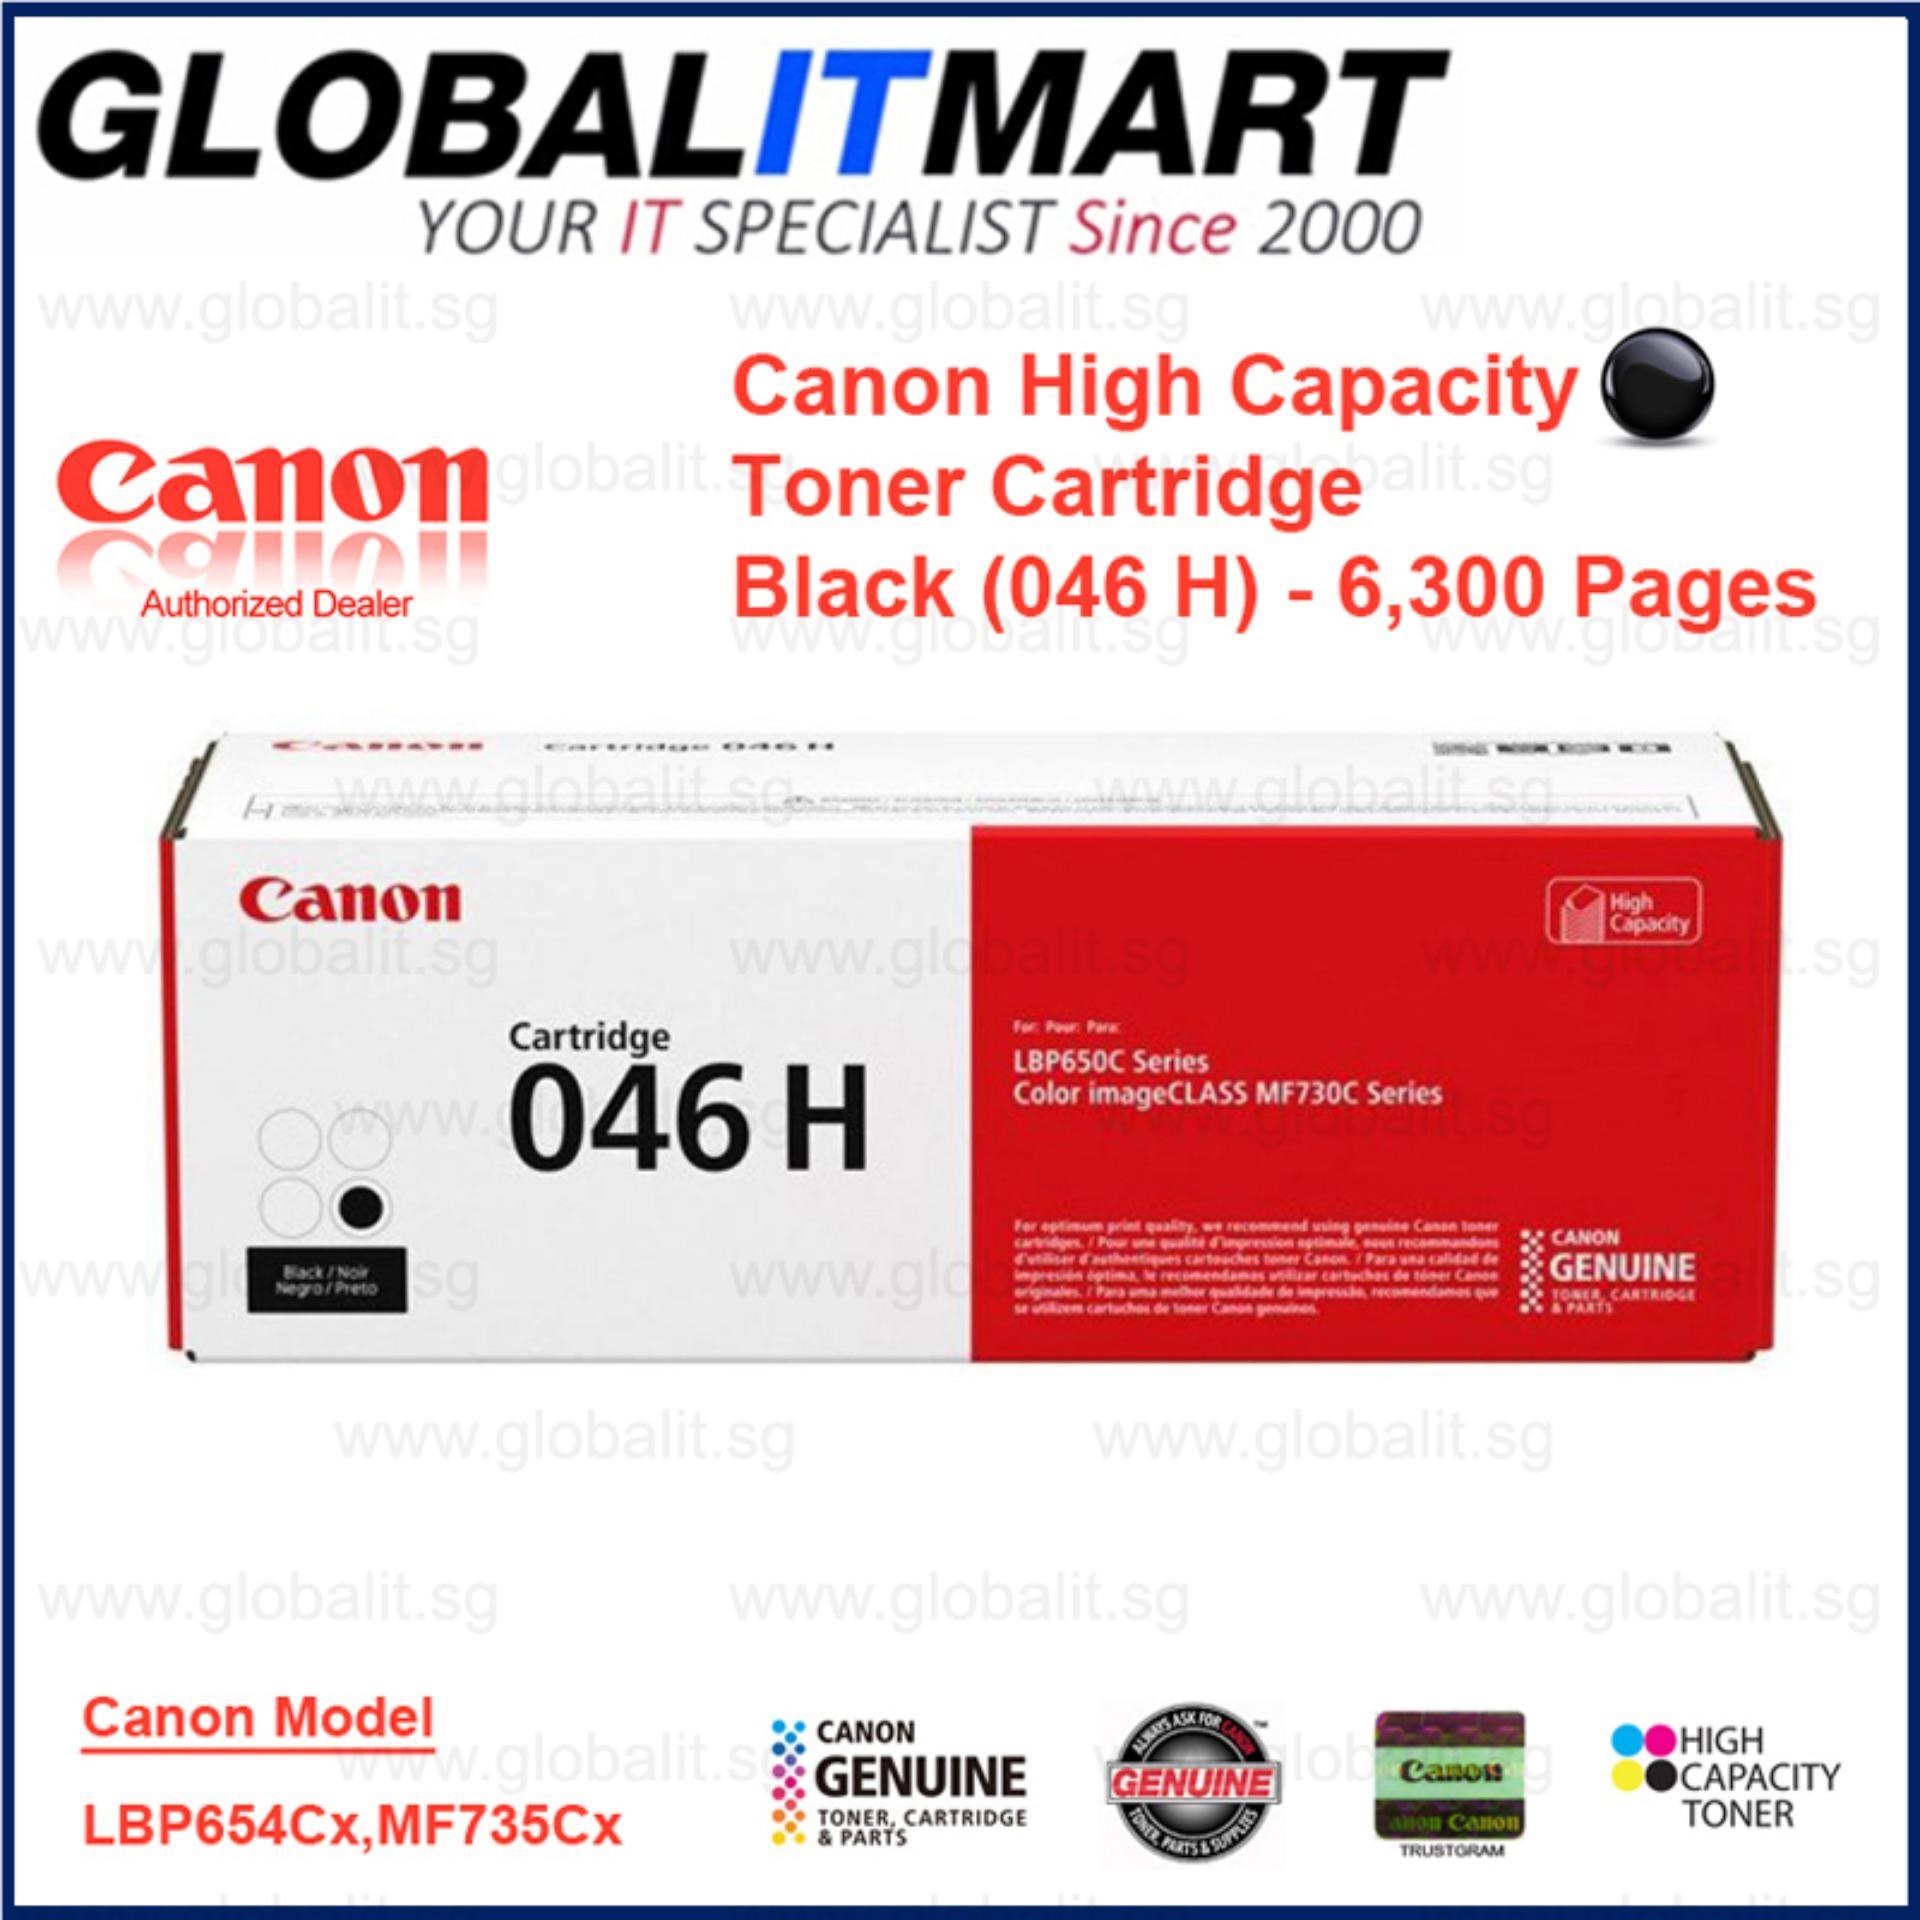 Canon Ink Cartridges 250 And 251 Xl Bk Price In Singapore Cartridge Pgi 750xl Black 046h Original Toner 6300 Pages For Lbp654cxmf735cx